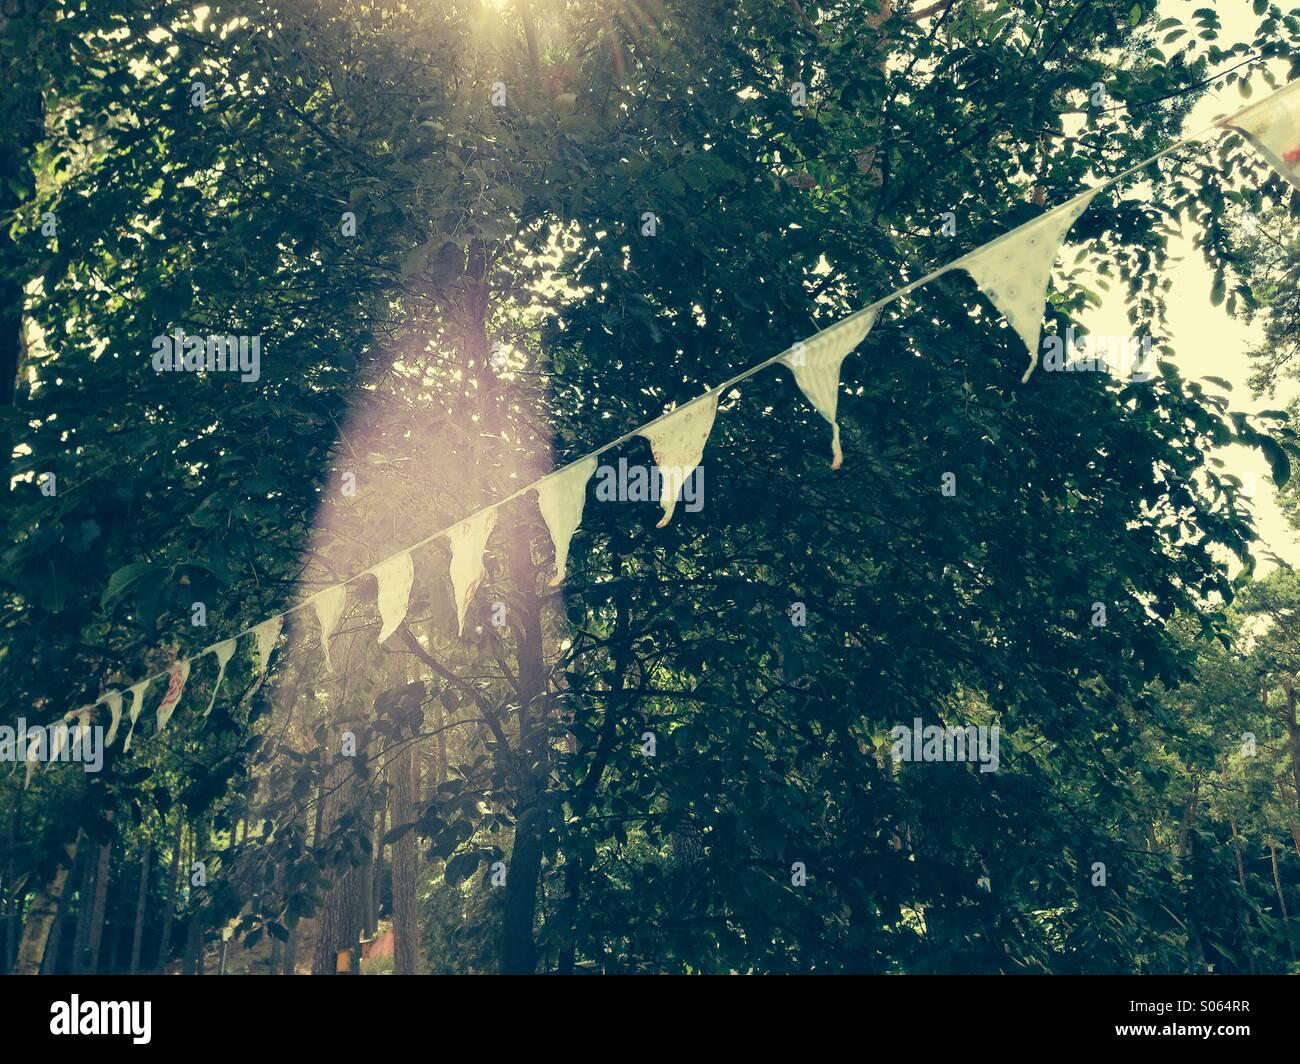 Wimpelgirlande im Sonnenstrahl - Stock Image